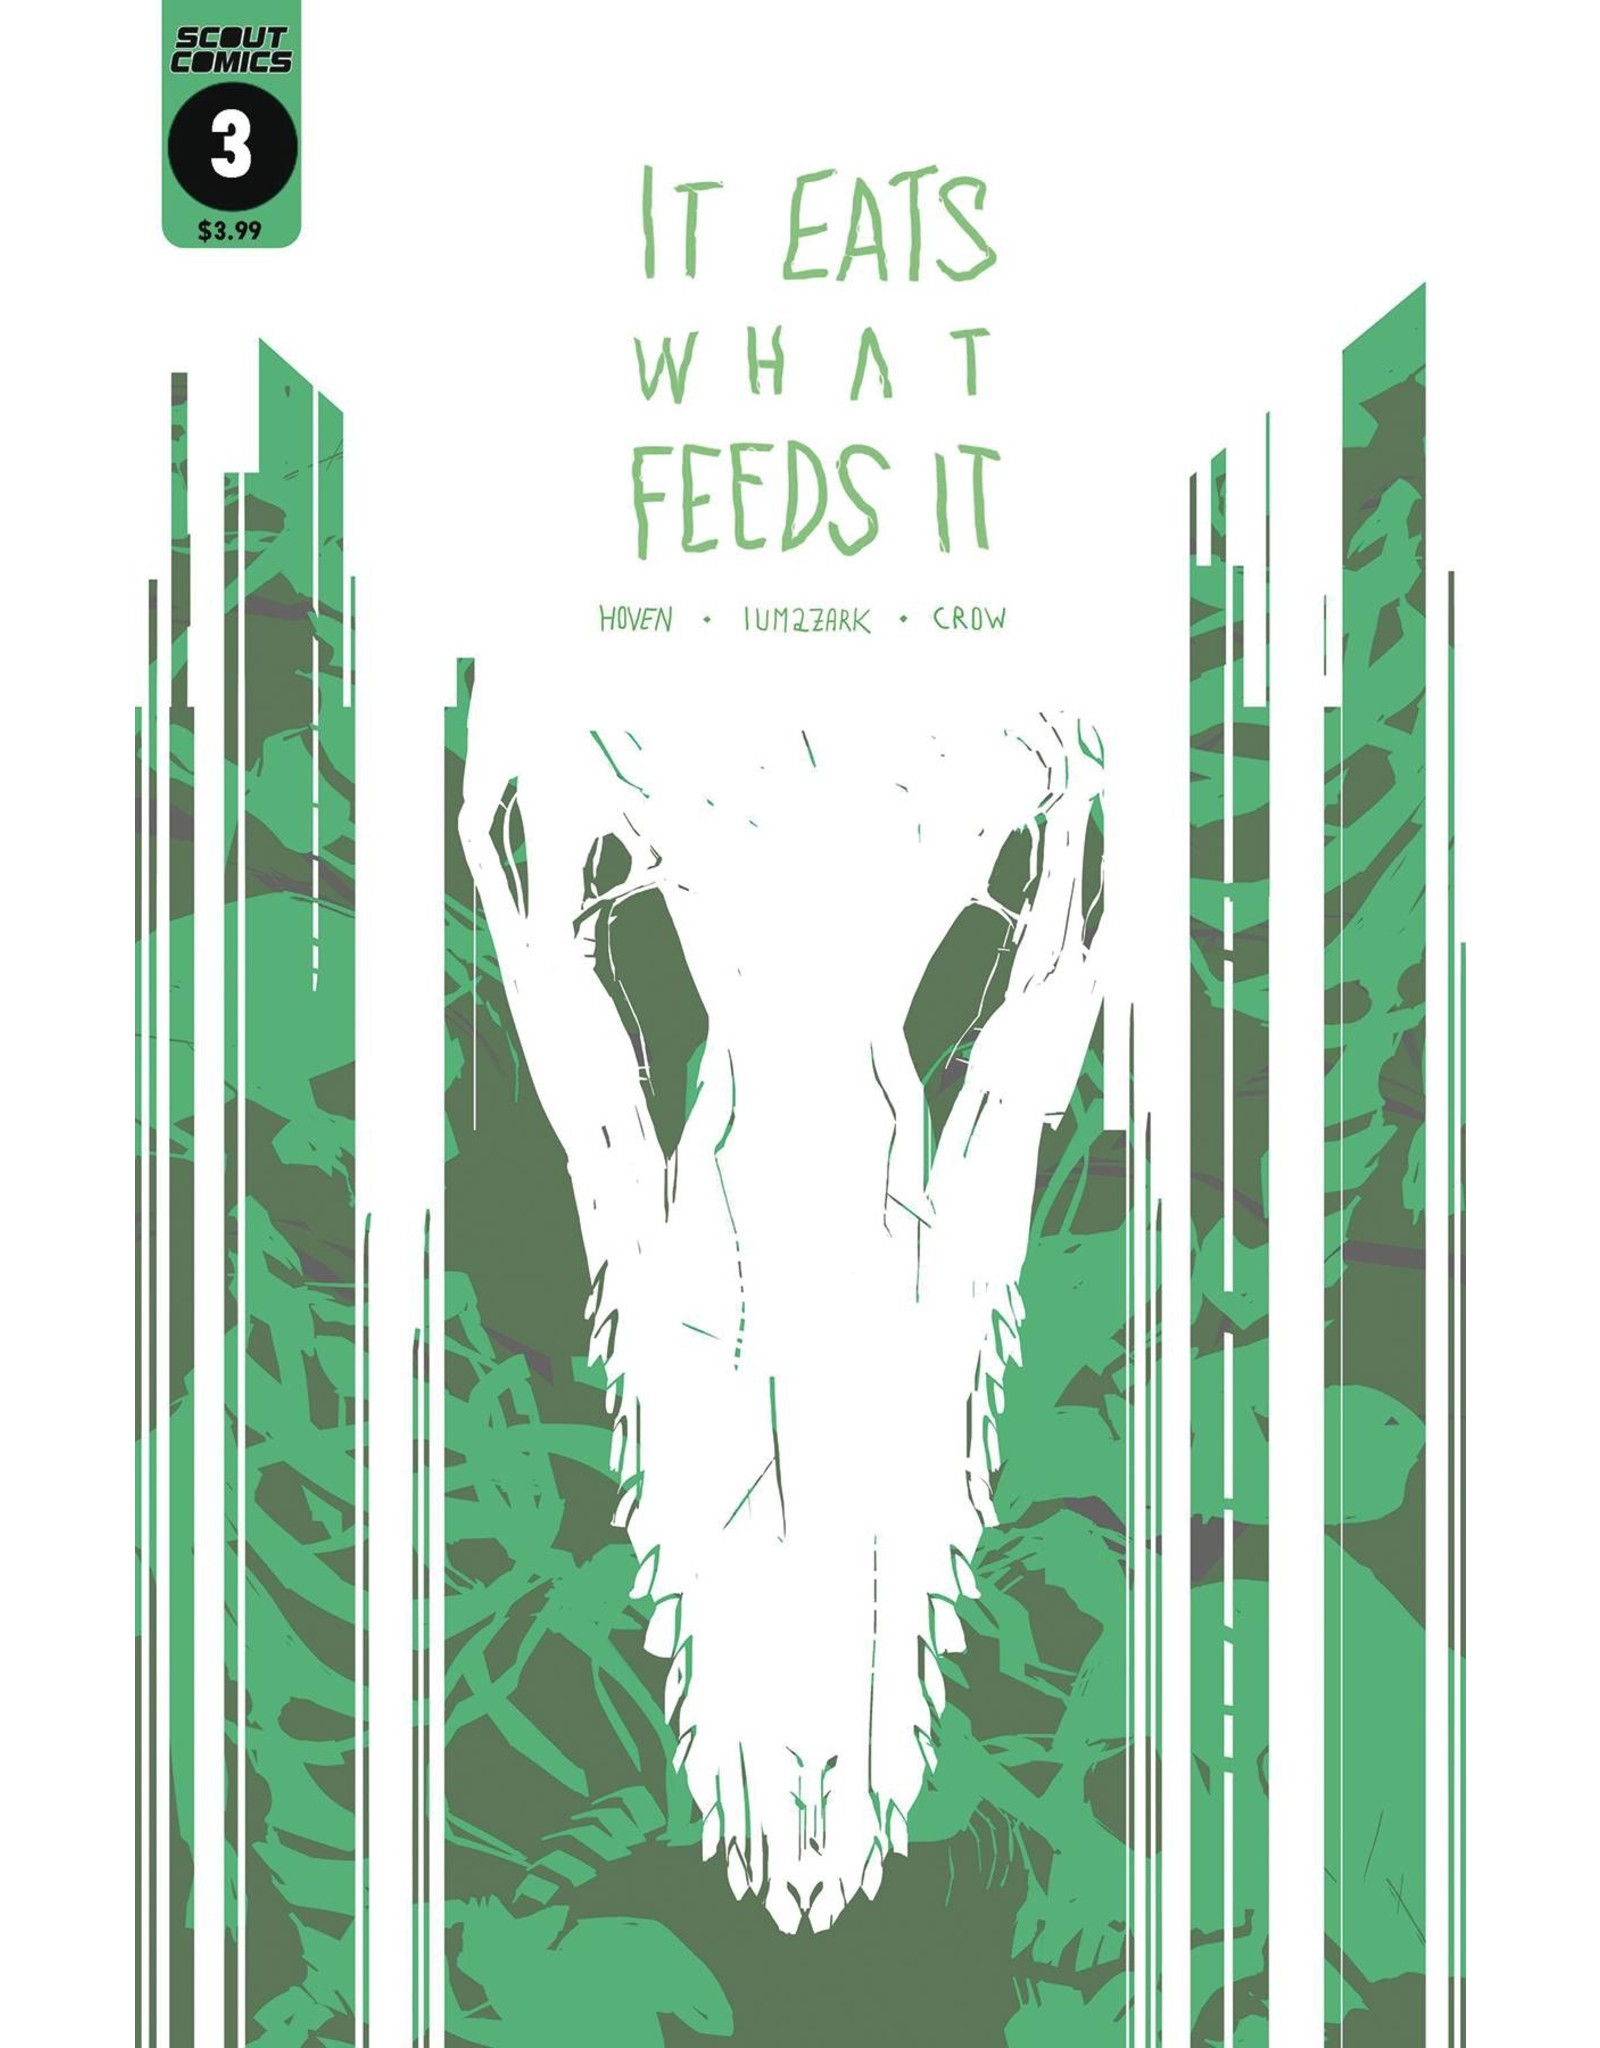 SCOUT COMICS IT EATS WHAT FEEDS IT #3